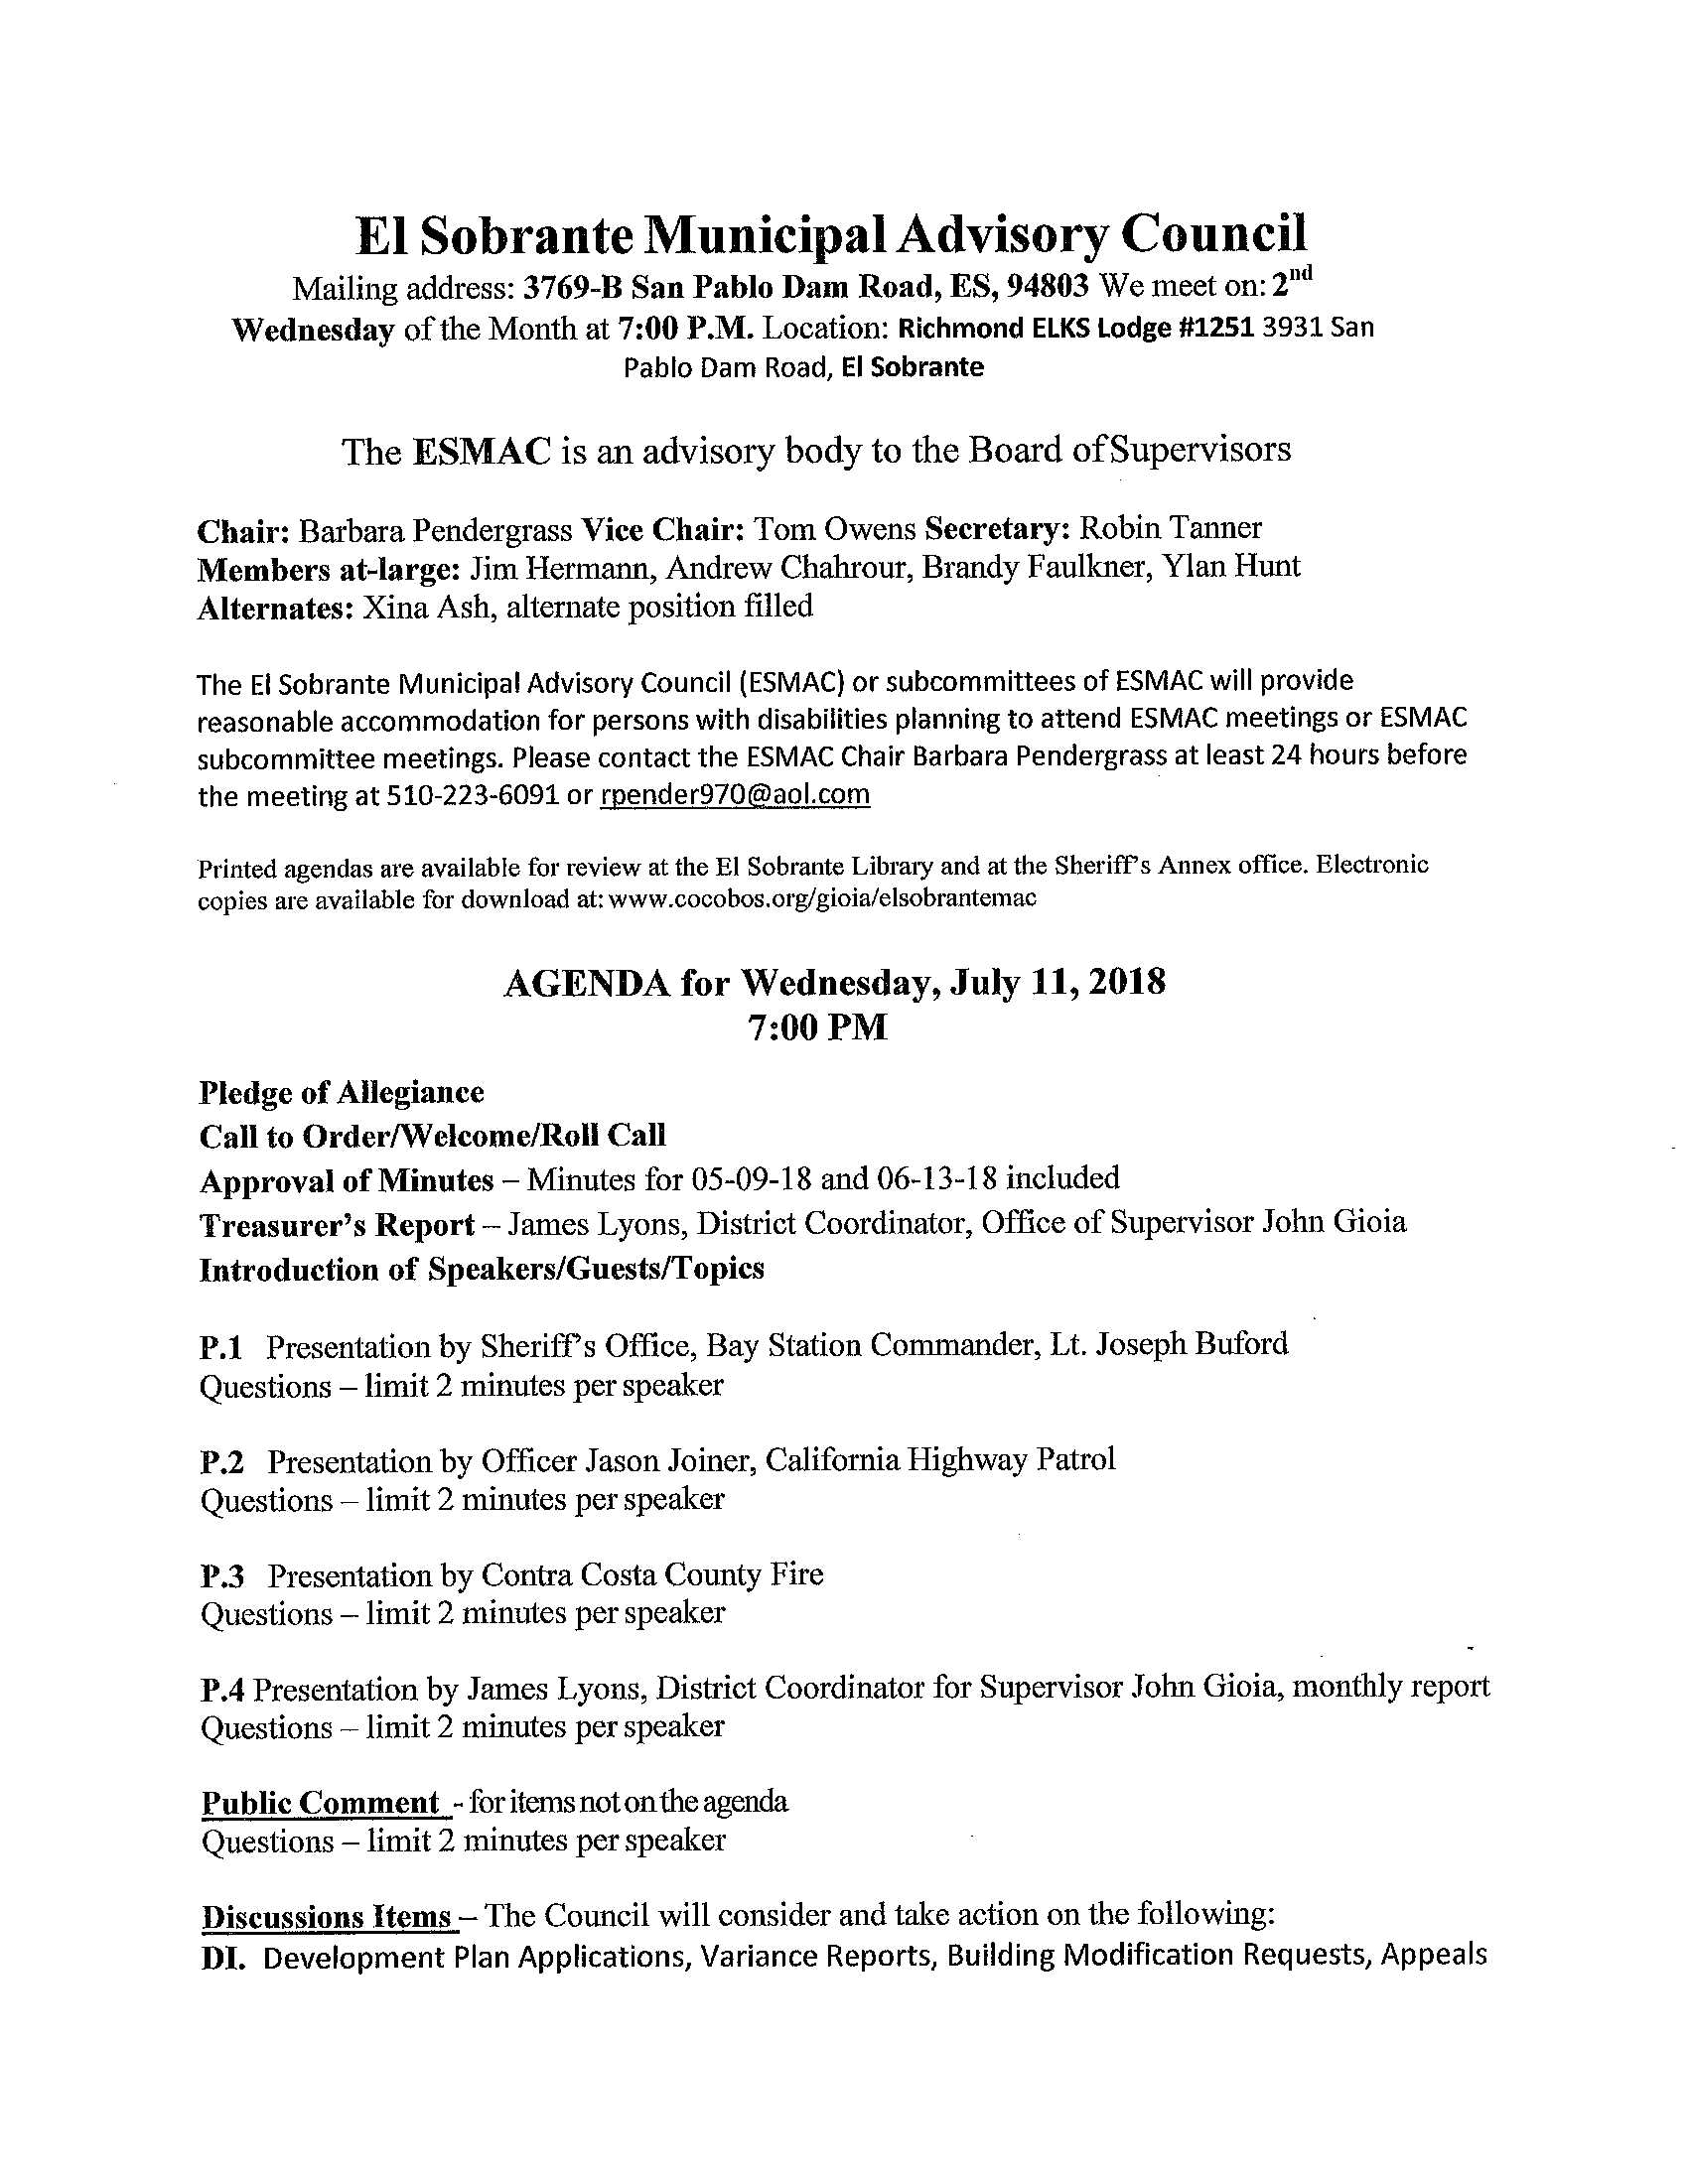 ESMAC Agenda 7.11.2018 (36 Pages)_1.jpg